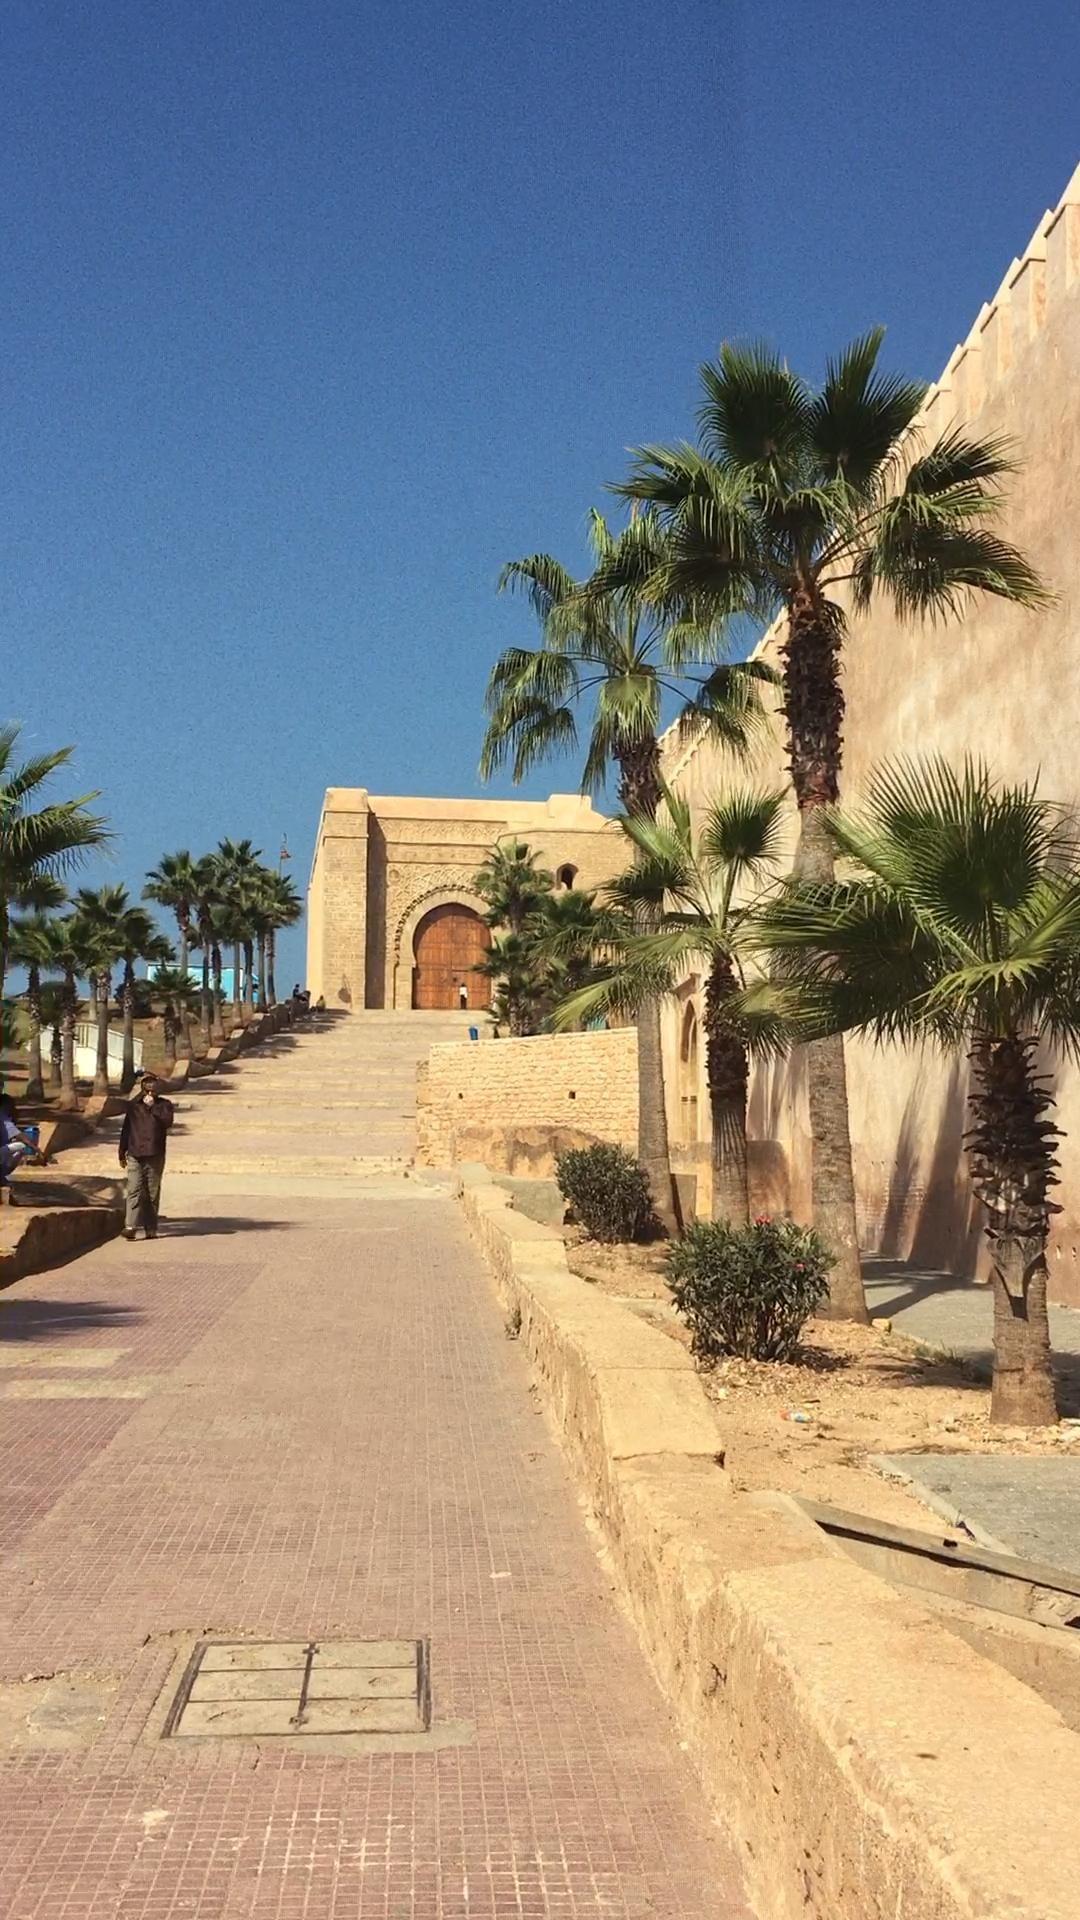 Challah Rabat Video In 2020 Beautiful Places To Travel Rabat Morocco Dubai Vacation